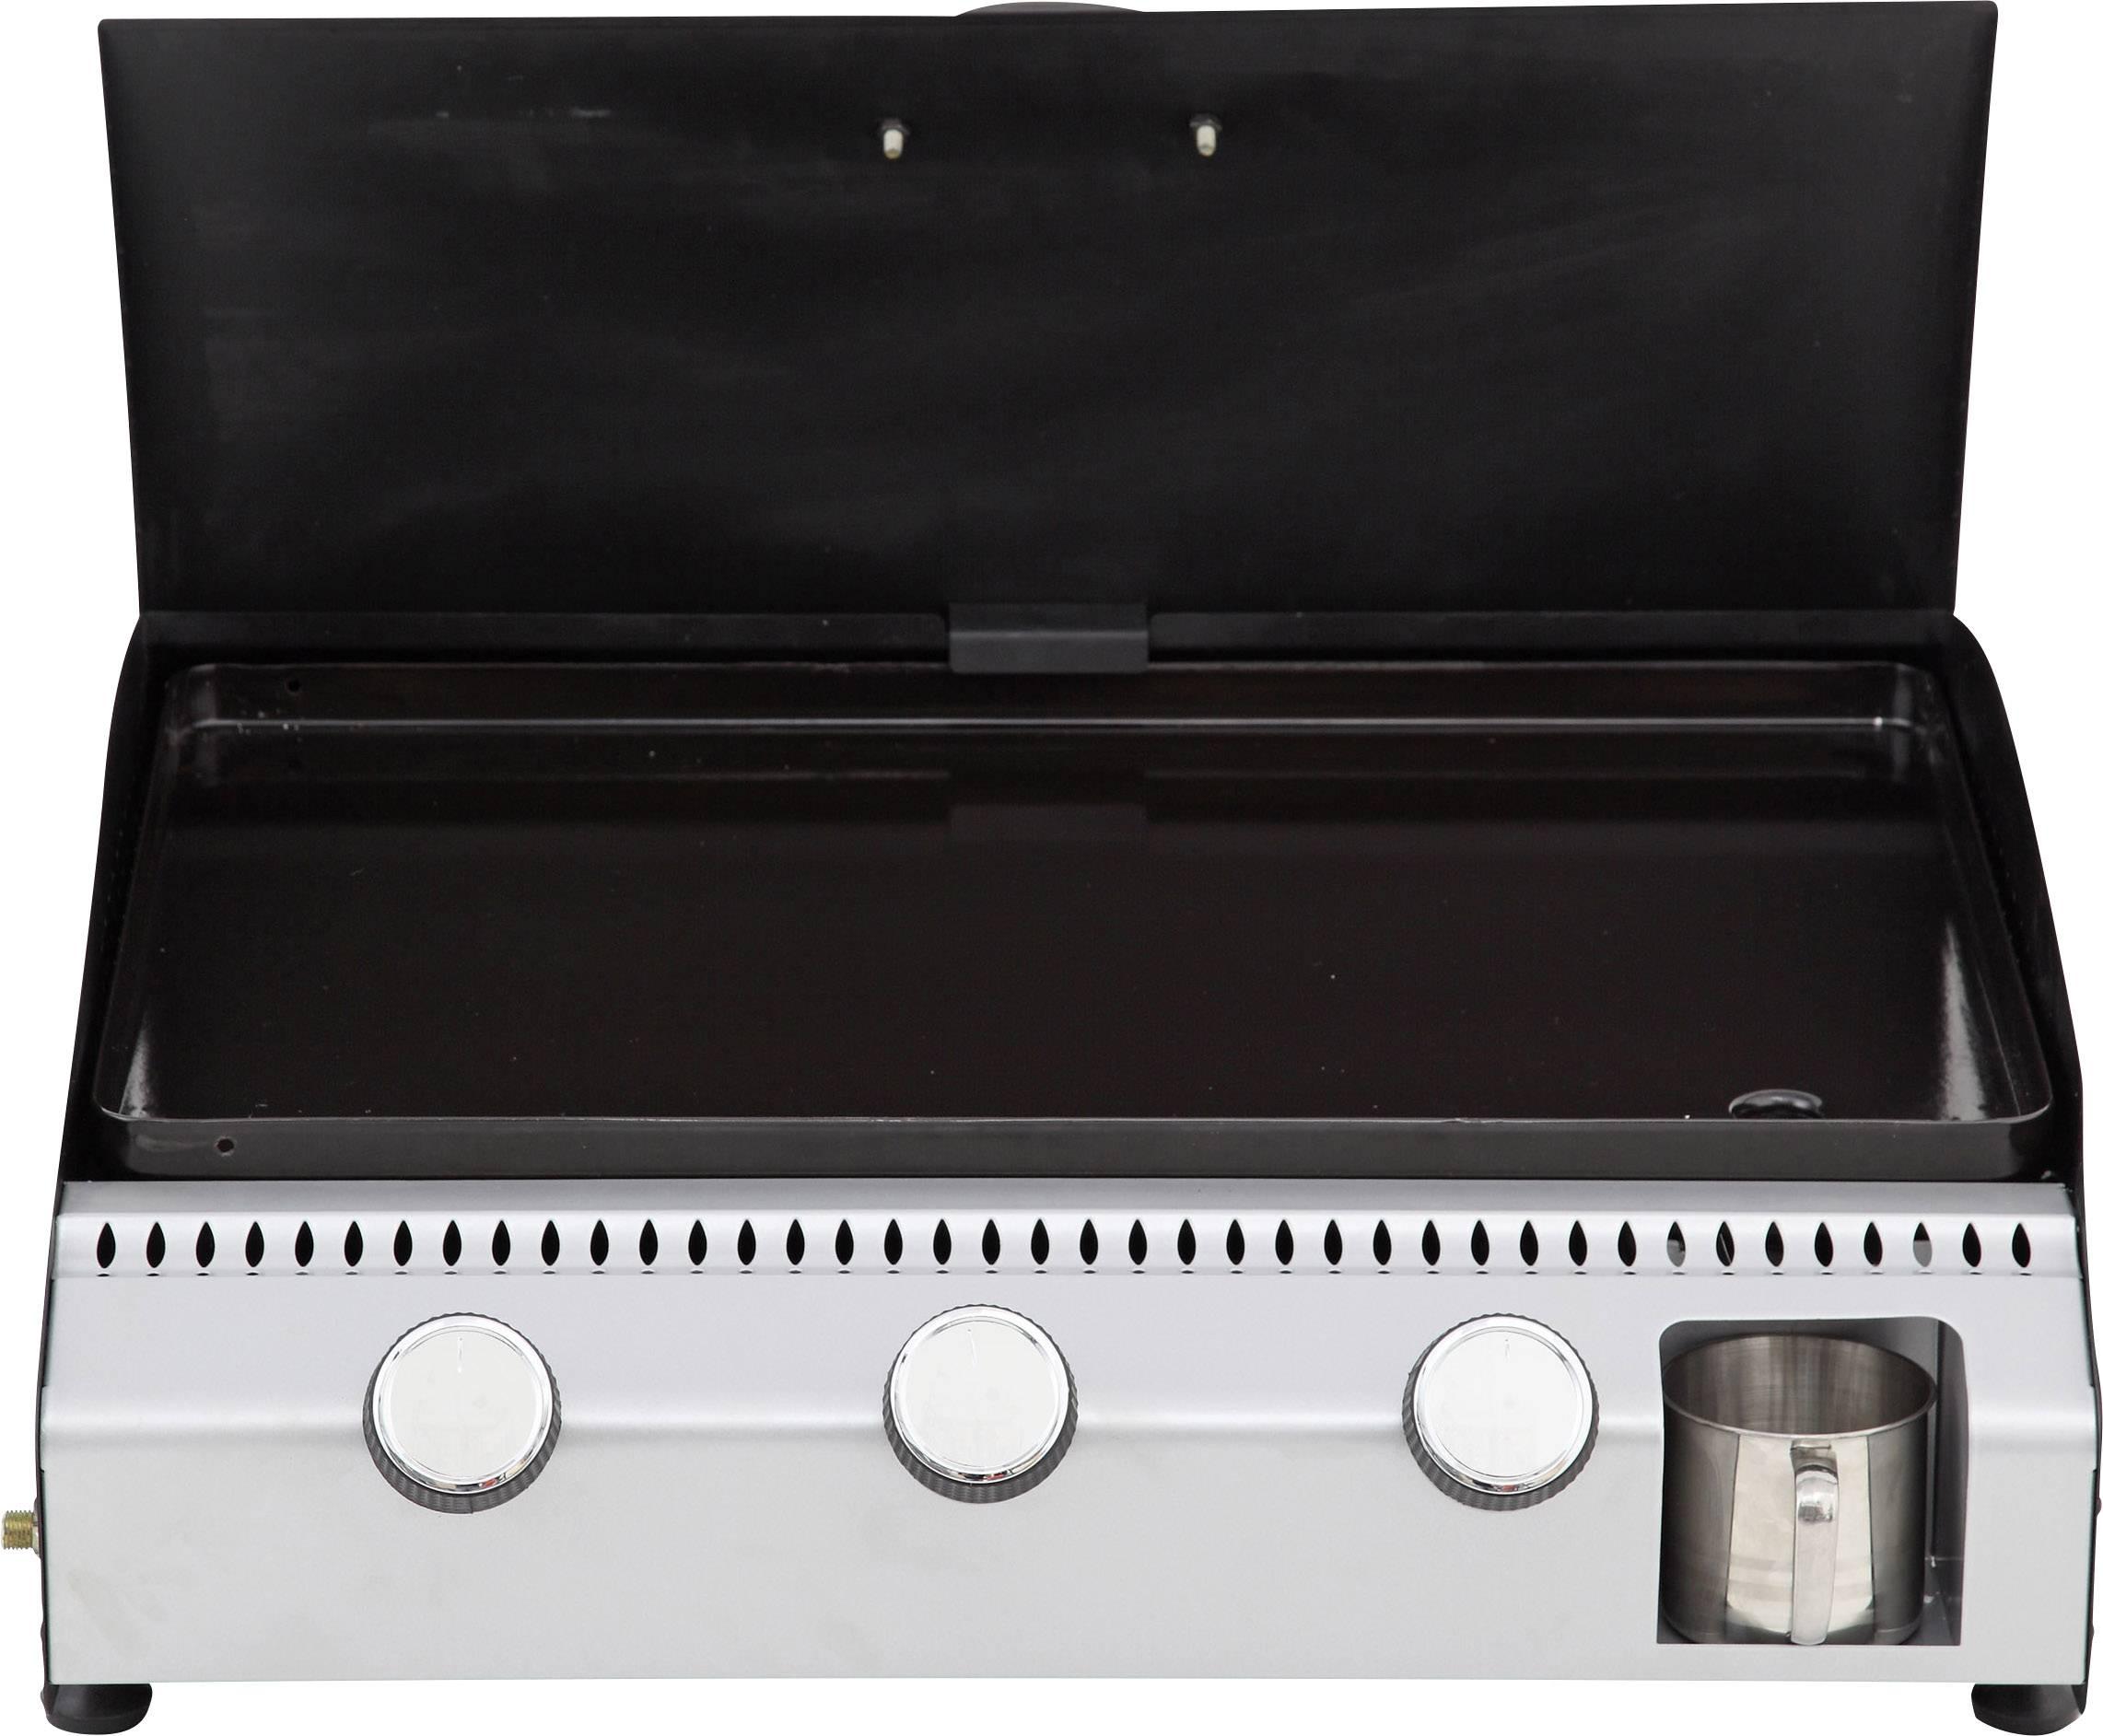 Plancha Für Gasgrill : Verycook u plancha servier grillwagen rückwand holz metall